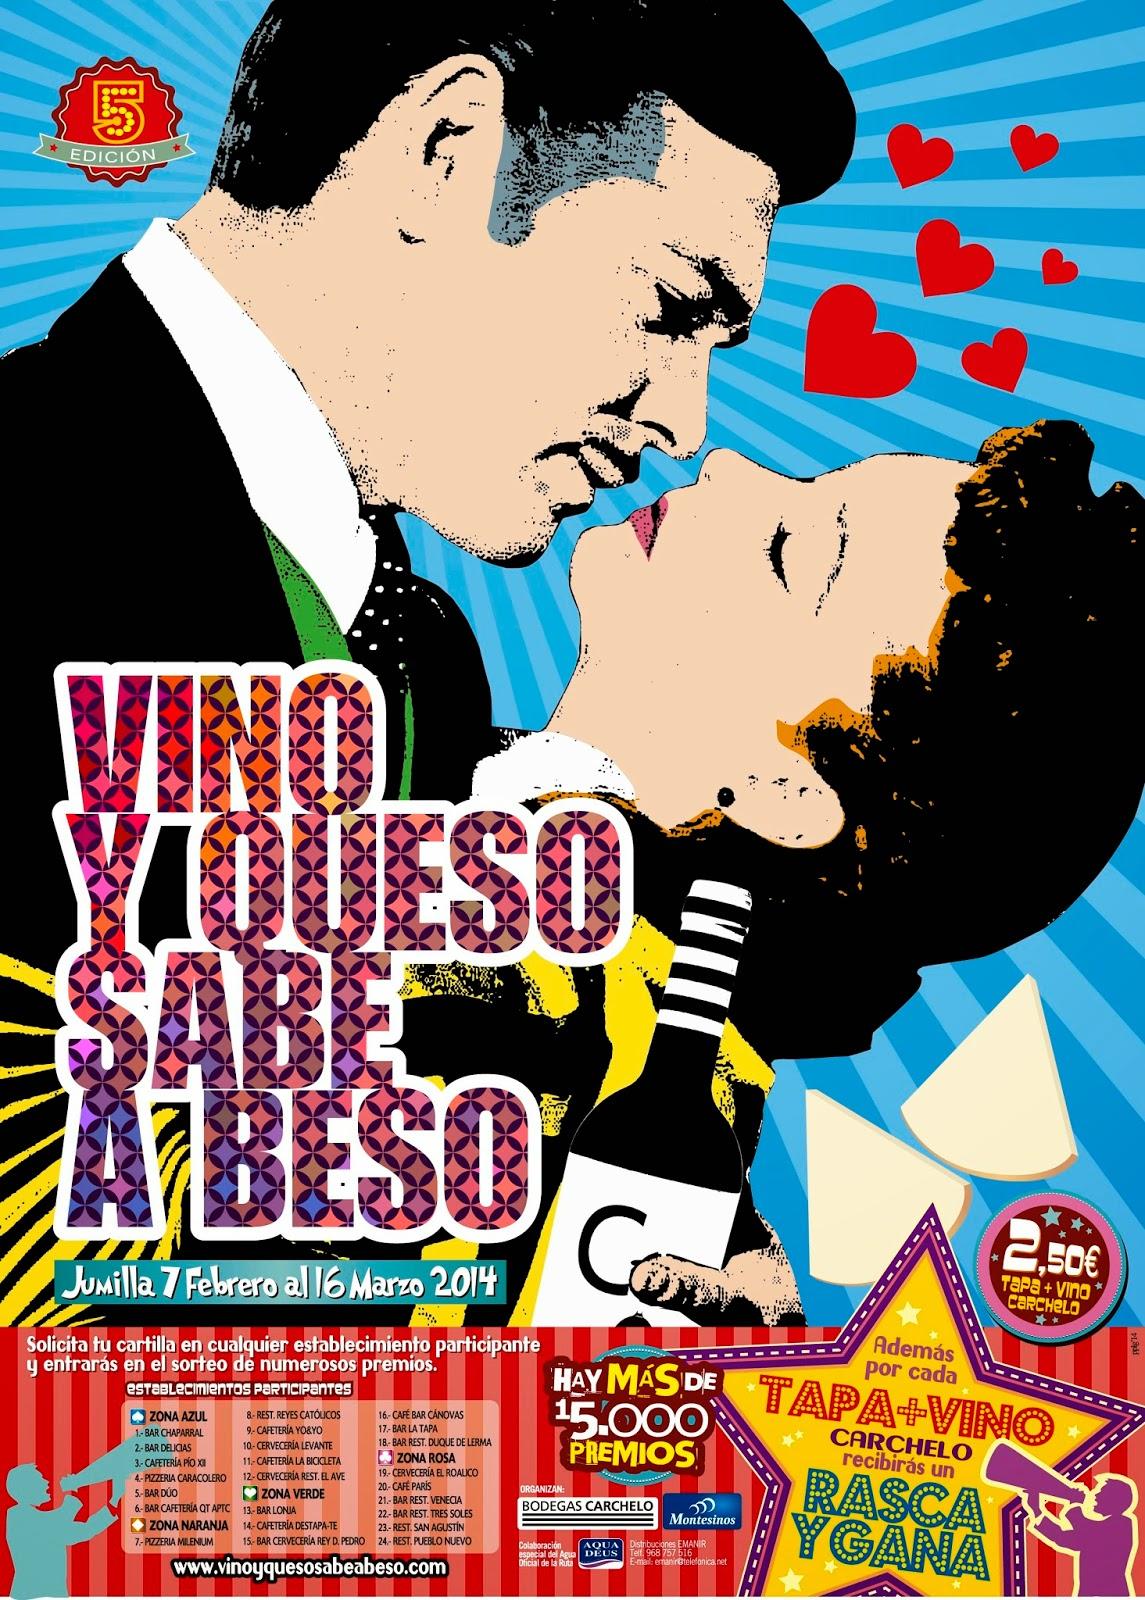 http://vinoyquesosabeabeso.com/